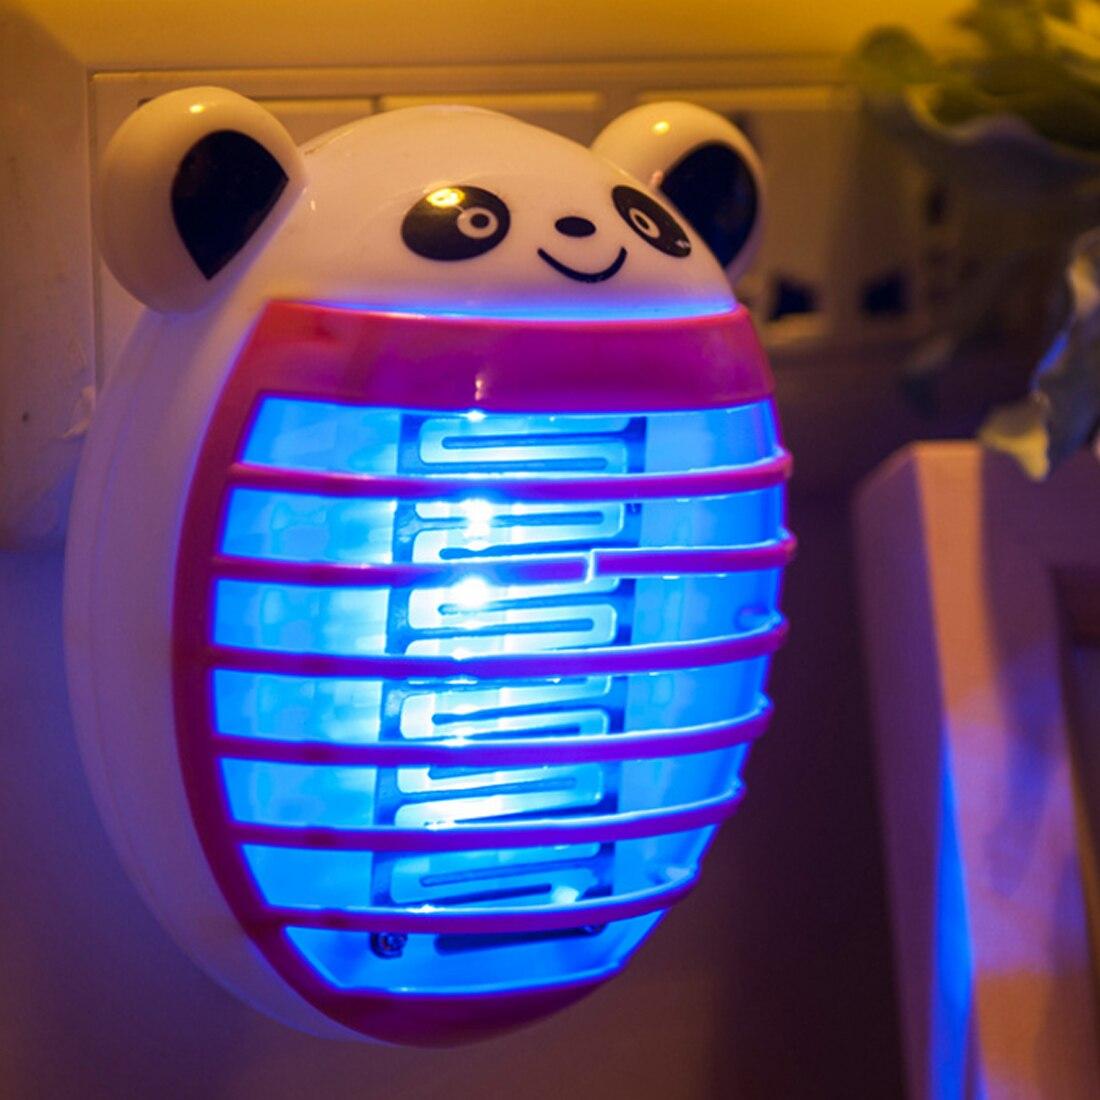 Iguardor Cute Household Mosquito Killer Lamp LED Light